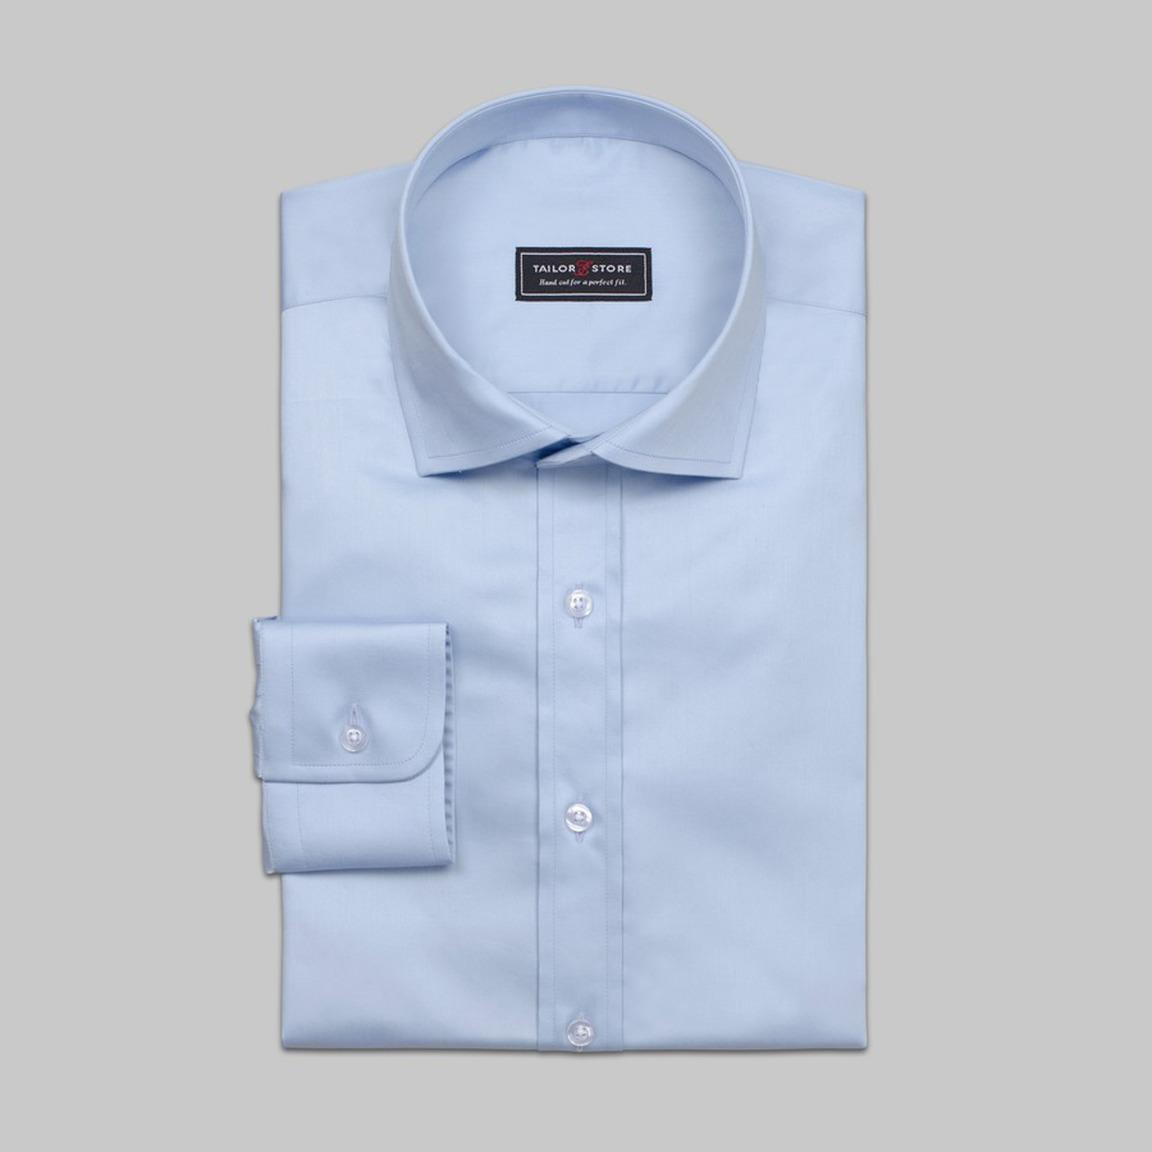 Business Hemd in elegantem hellblauen satin